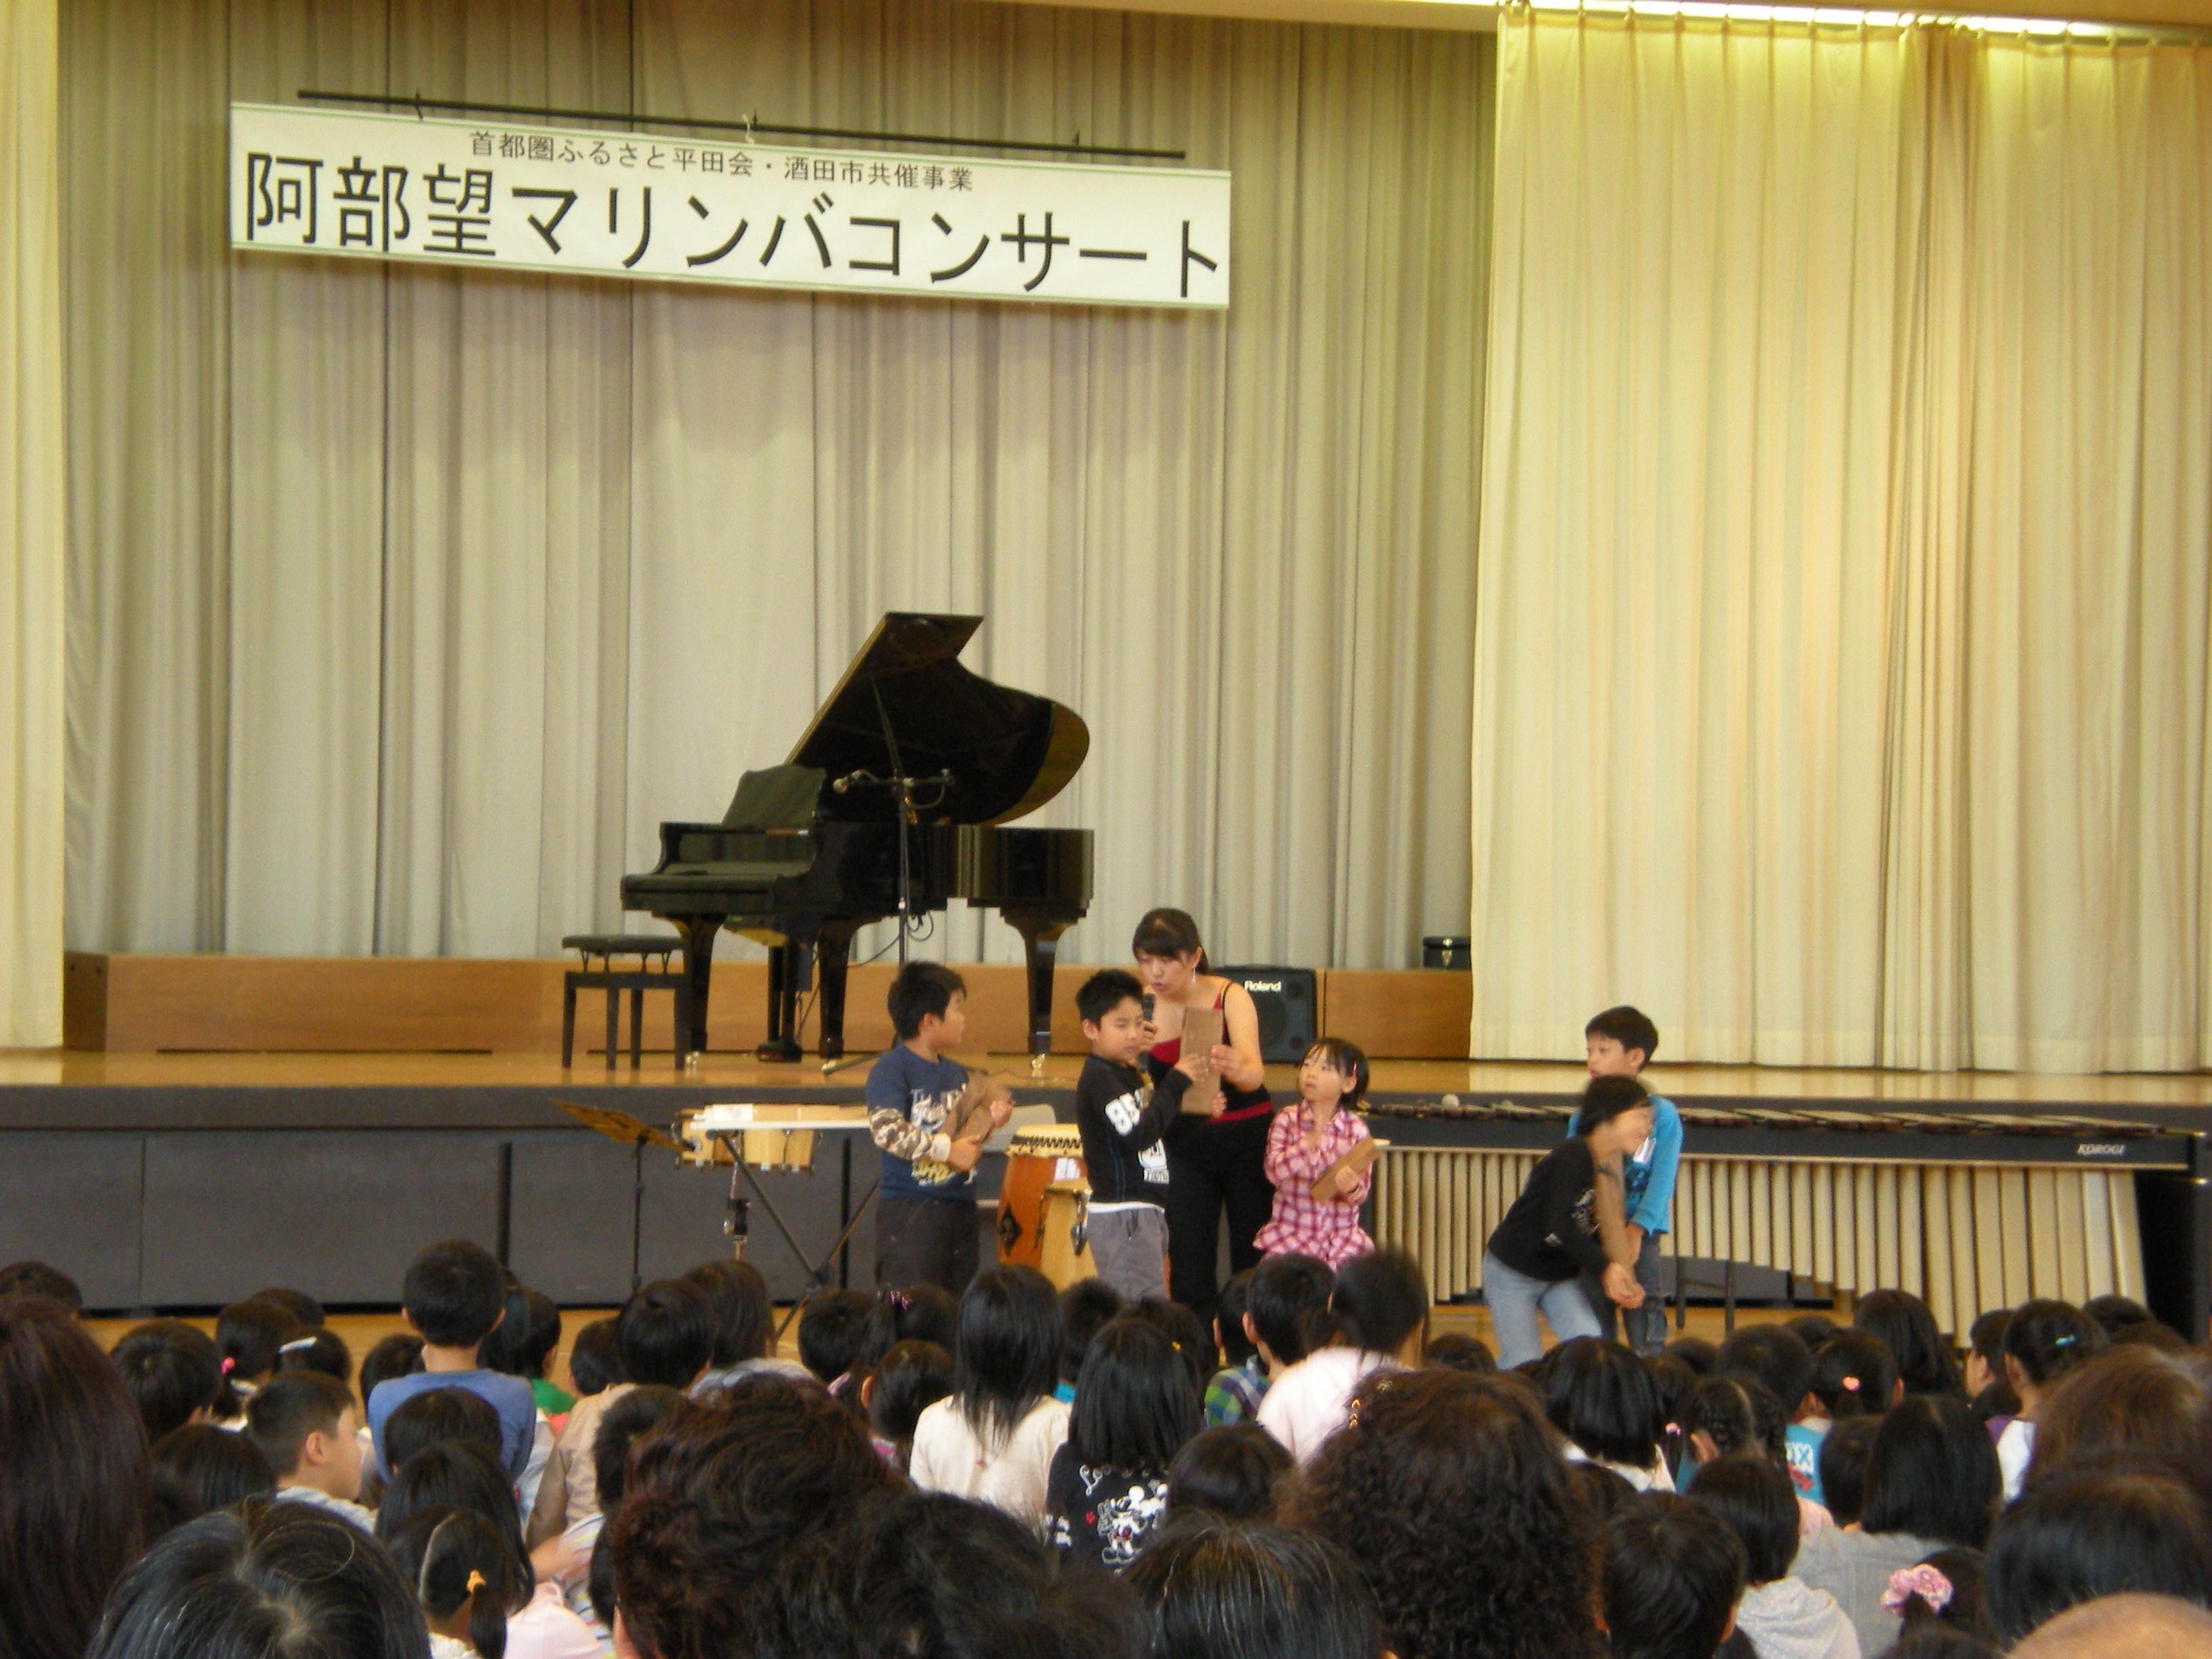 http://nozomiabe.com/diary/img/026.JPG